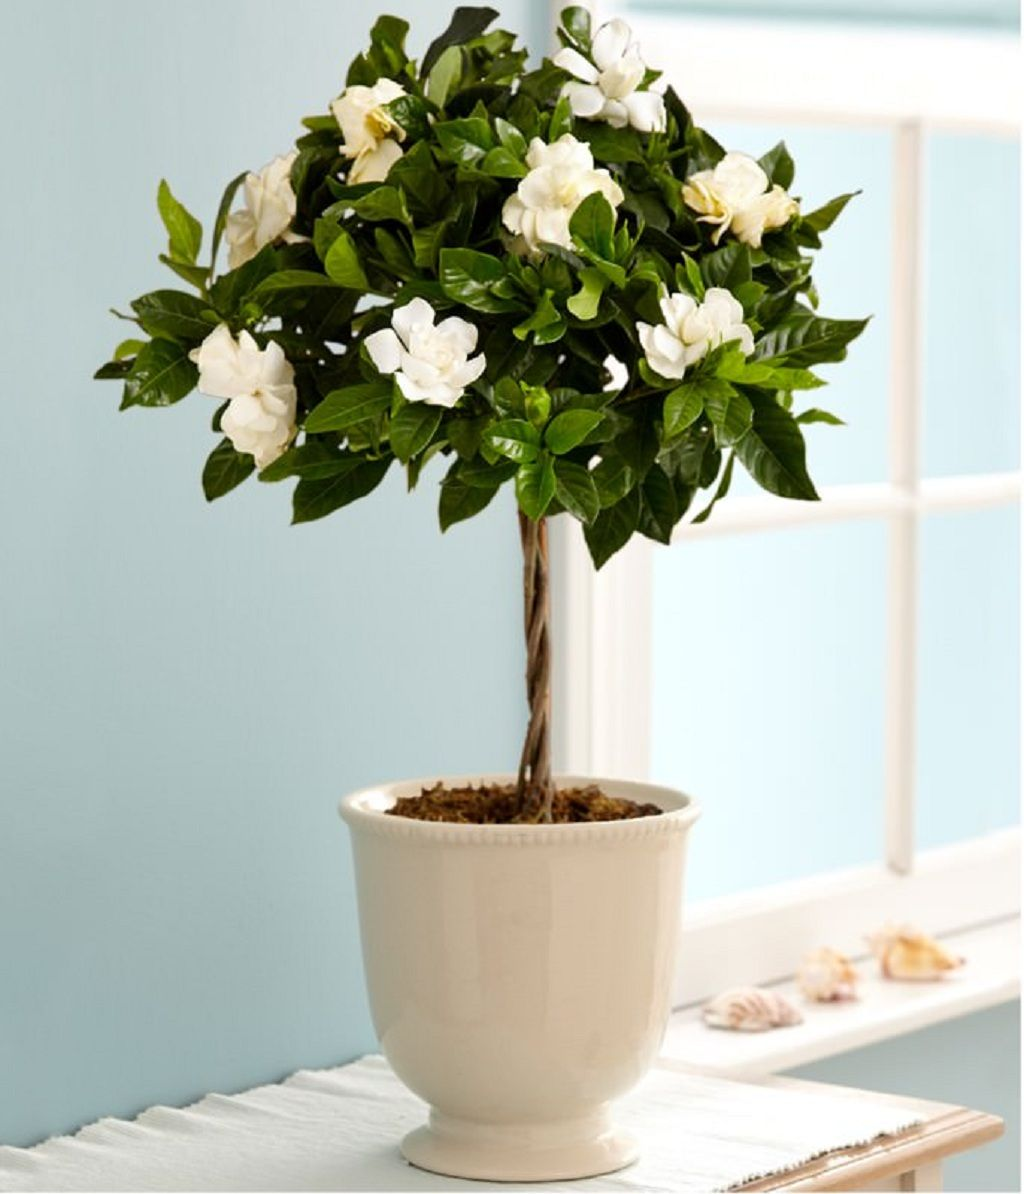 Sweet Fragrance Of Gardenia Flowers In The Bedroom Has Effectiveness Impact In Relaxing The Body And Brain Best Indoor Gardenia Plant Growing Gardenias Plants